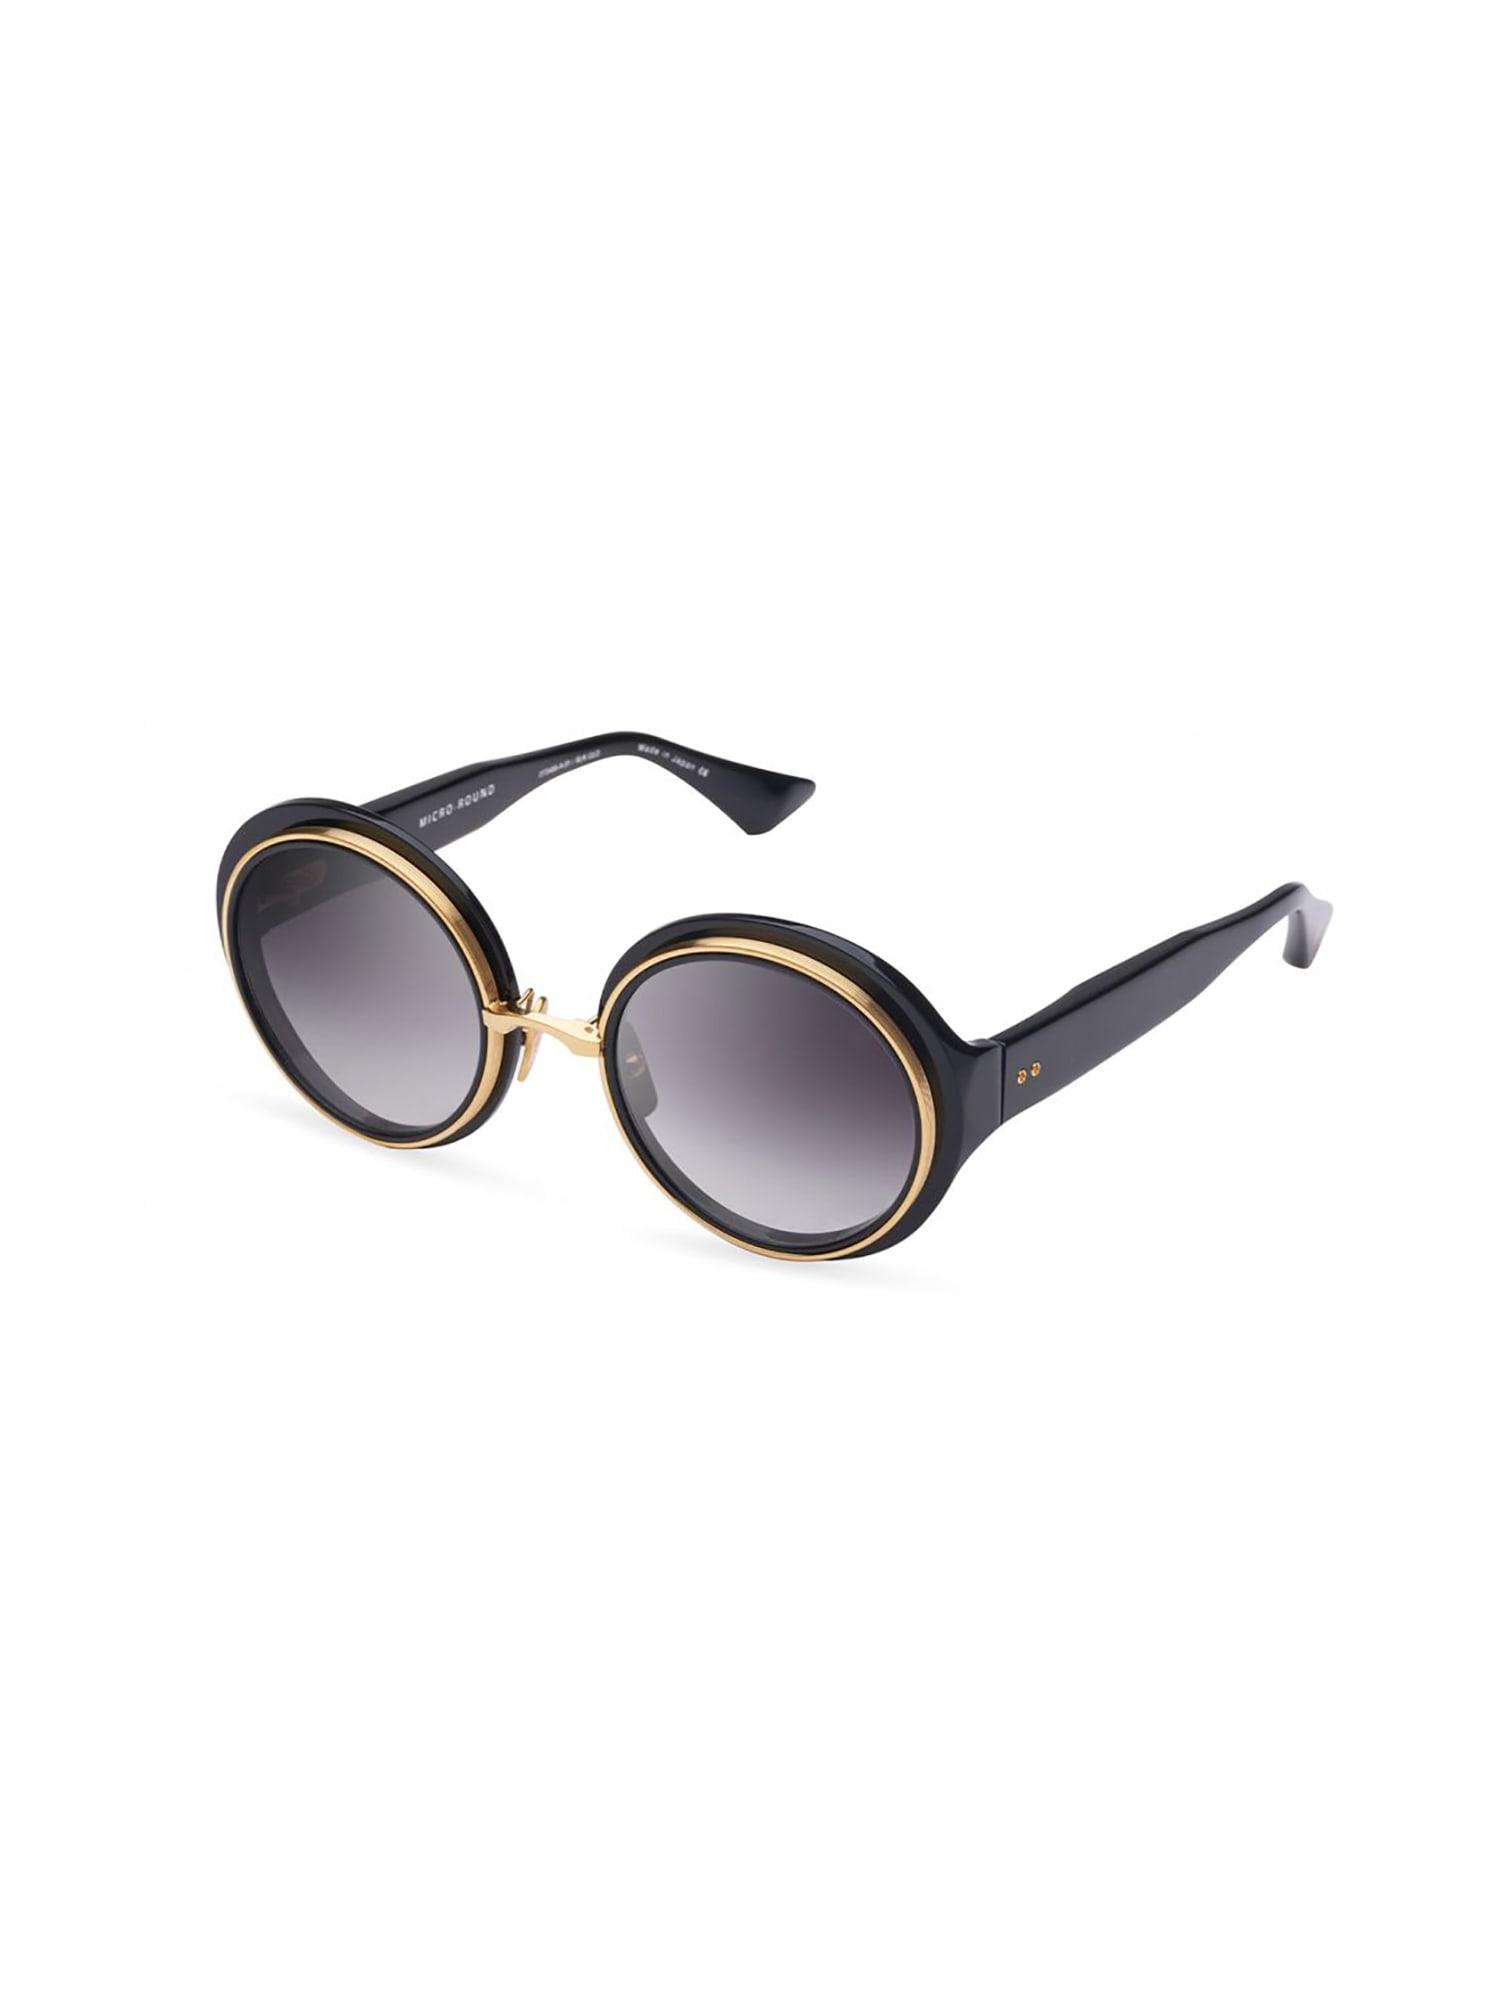 DTS406/A/01 MICRO Sunglasses